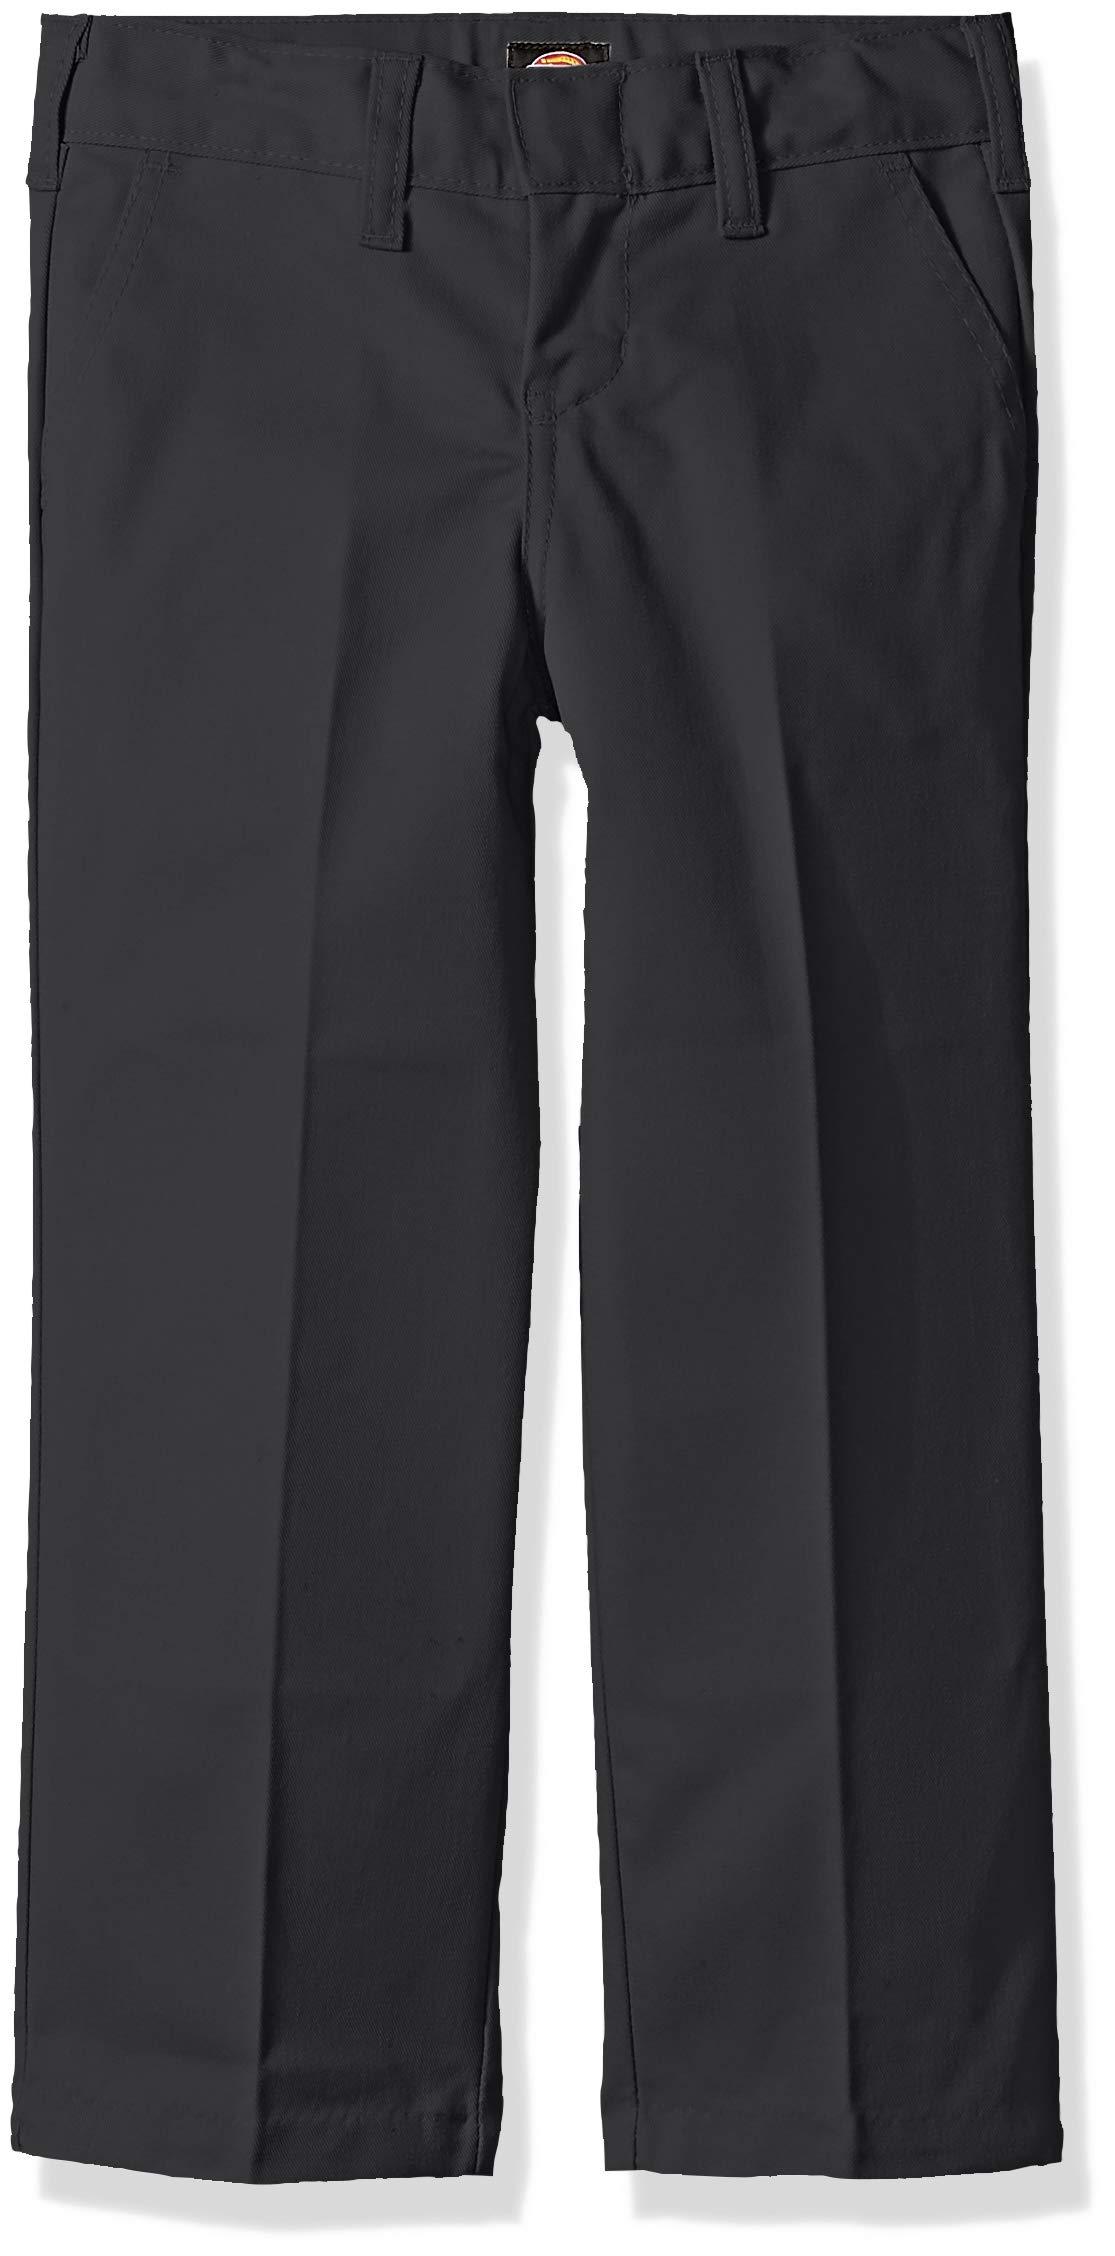 Dickies Kids Boys' Big Flexwaist Flat Front Straight Leg Pant, Charcoal, 14 by Dickies Kids